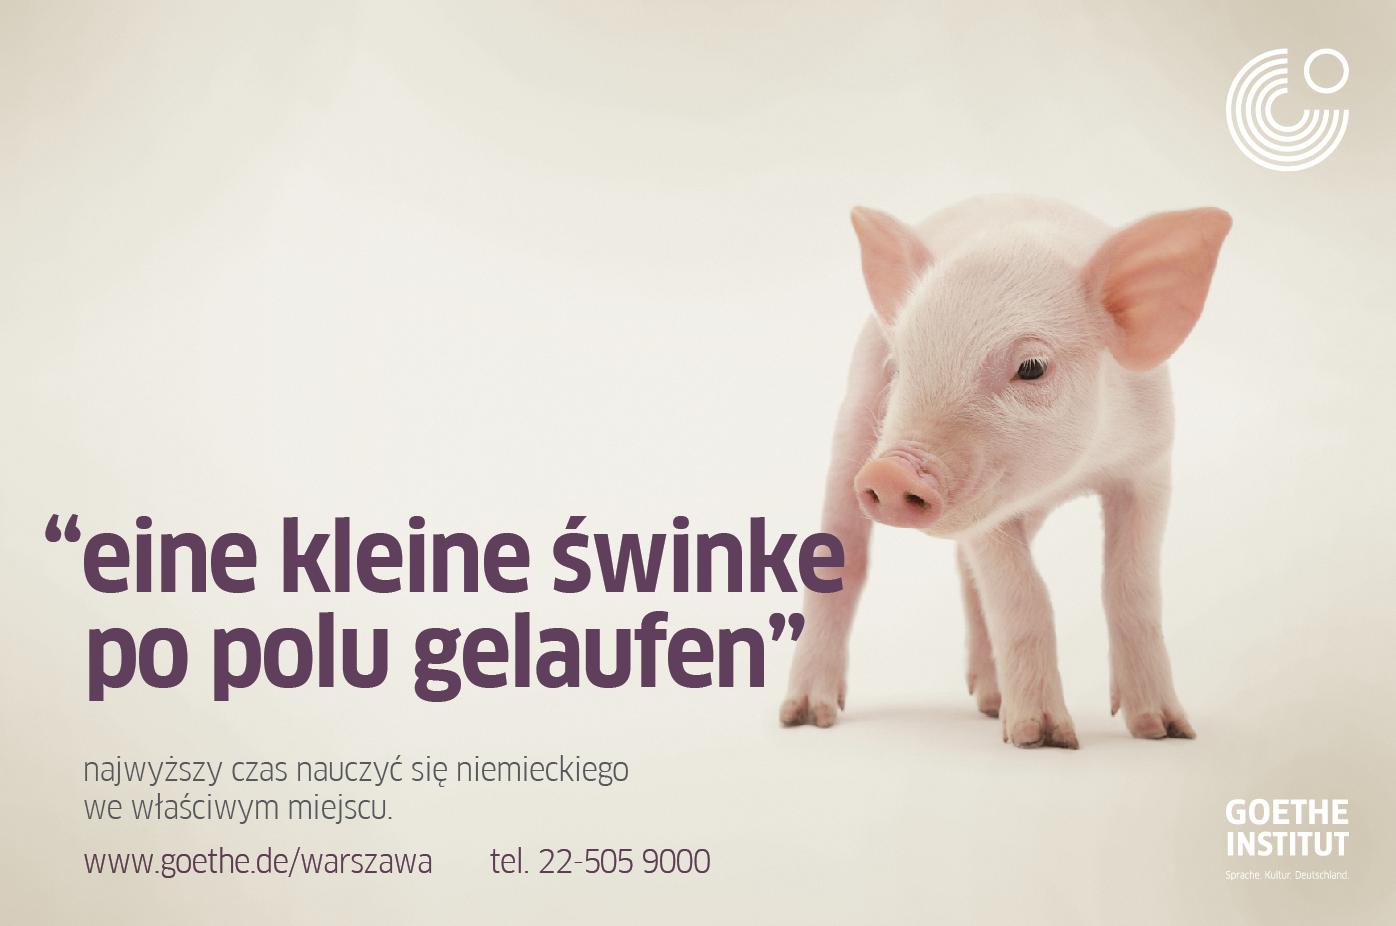 Eine kleine Swinke – Goethe-Institute campaign   leniva